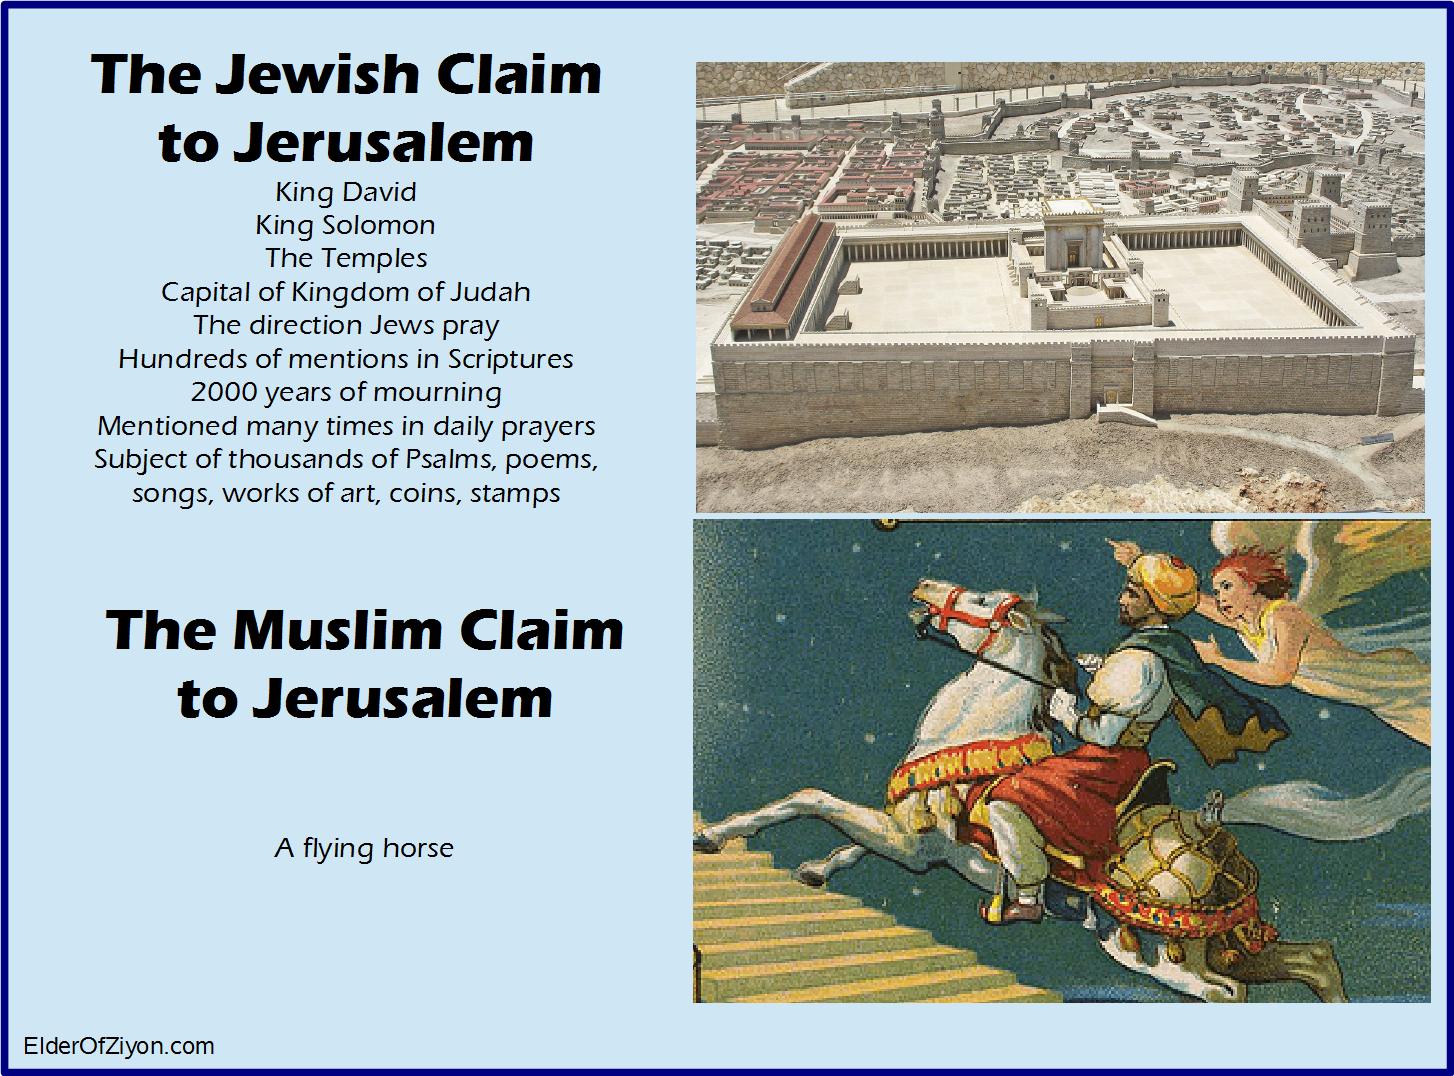 The Jewish vs. Muslim claim to Jerusalem (poster)